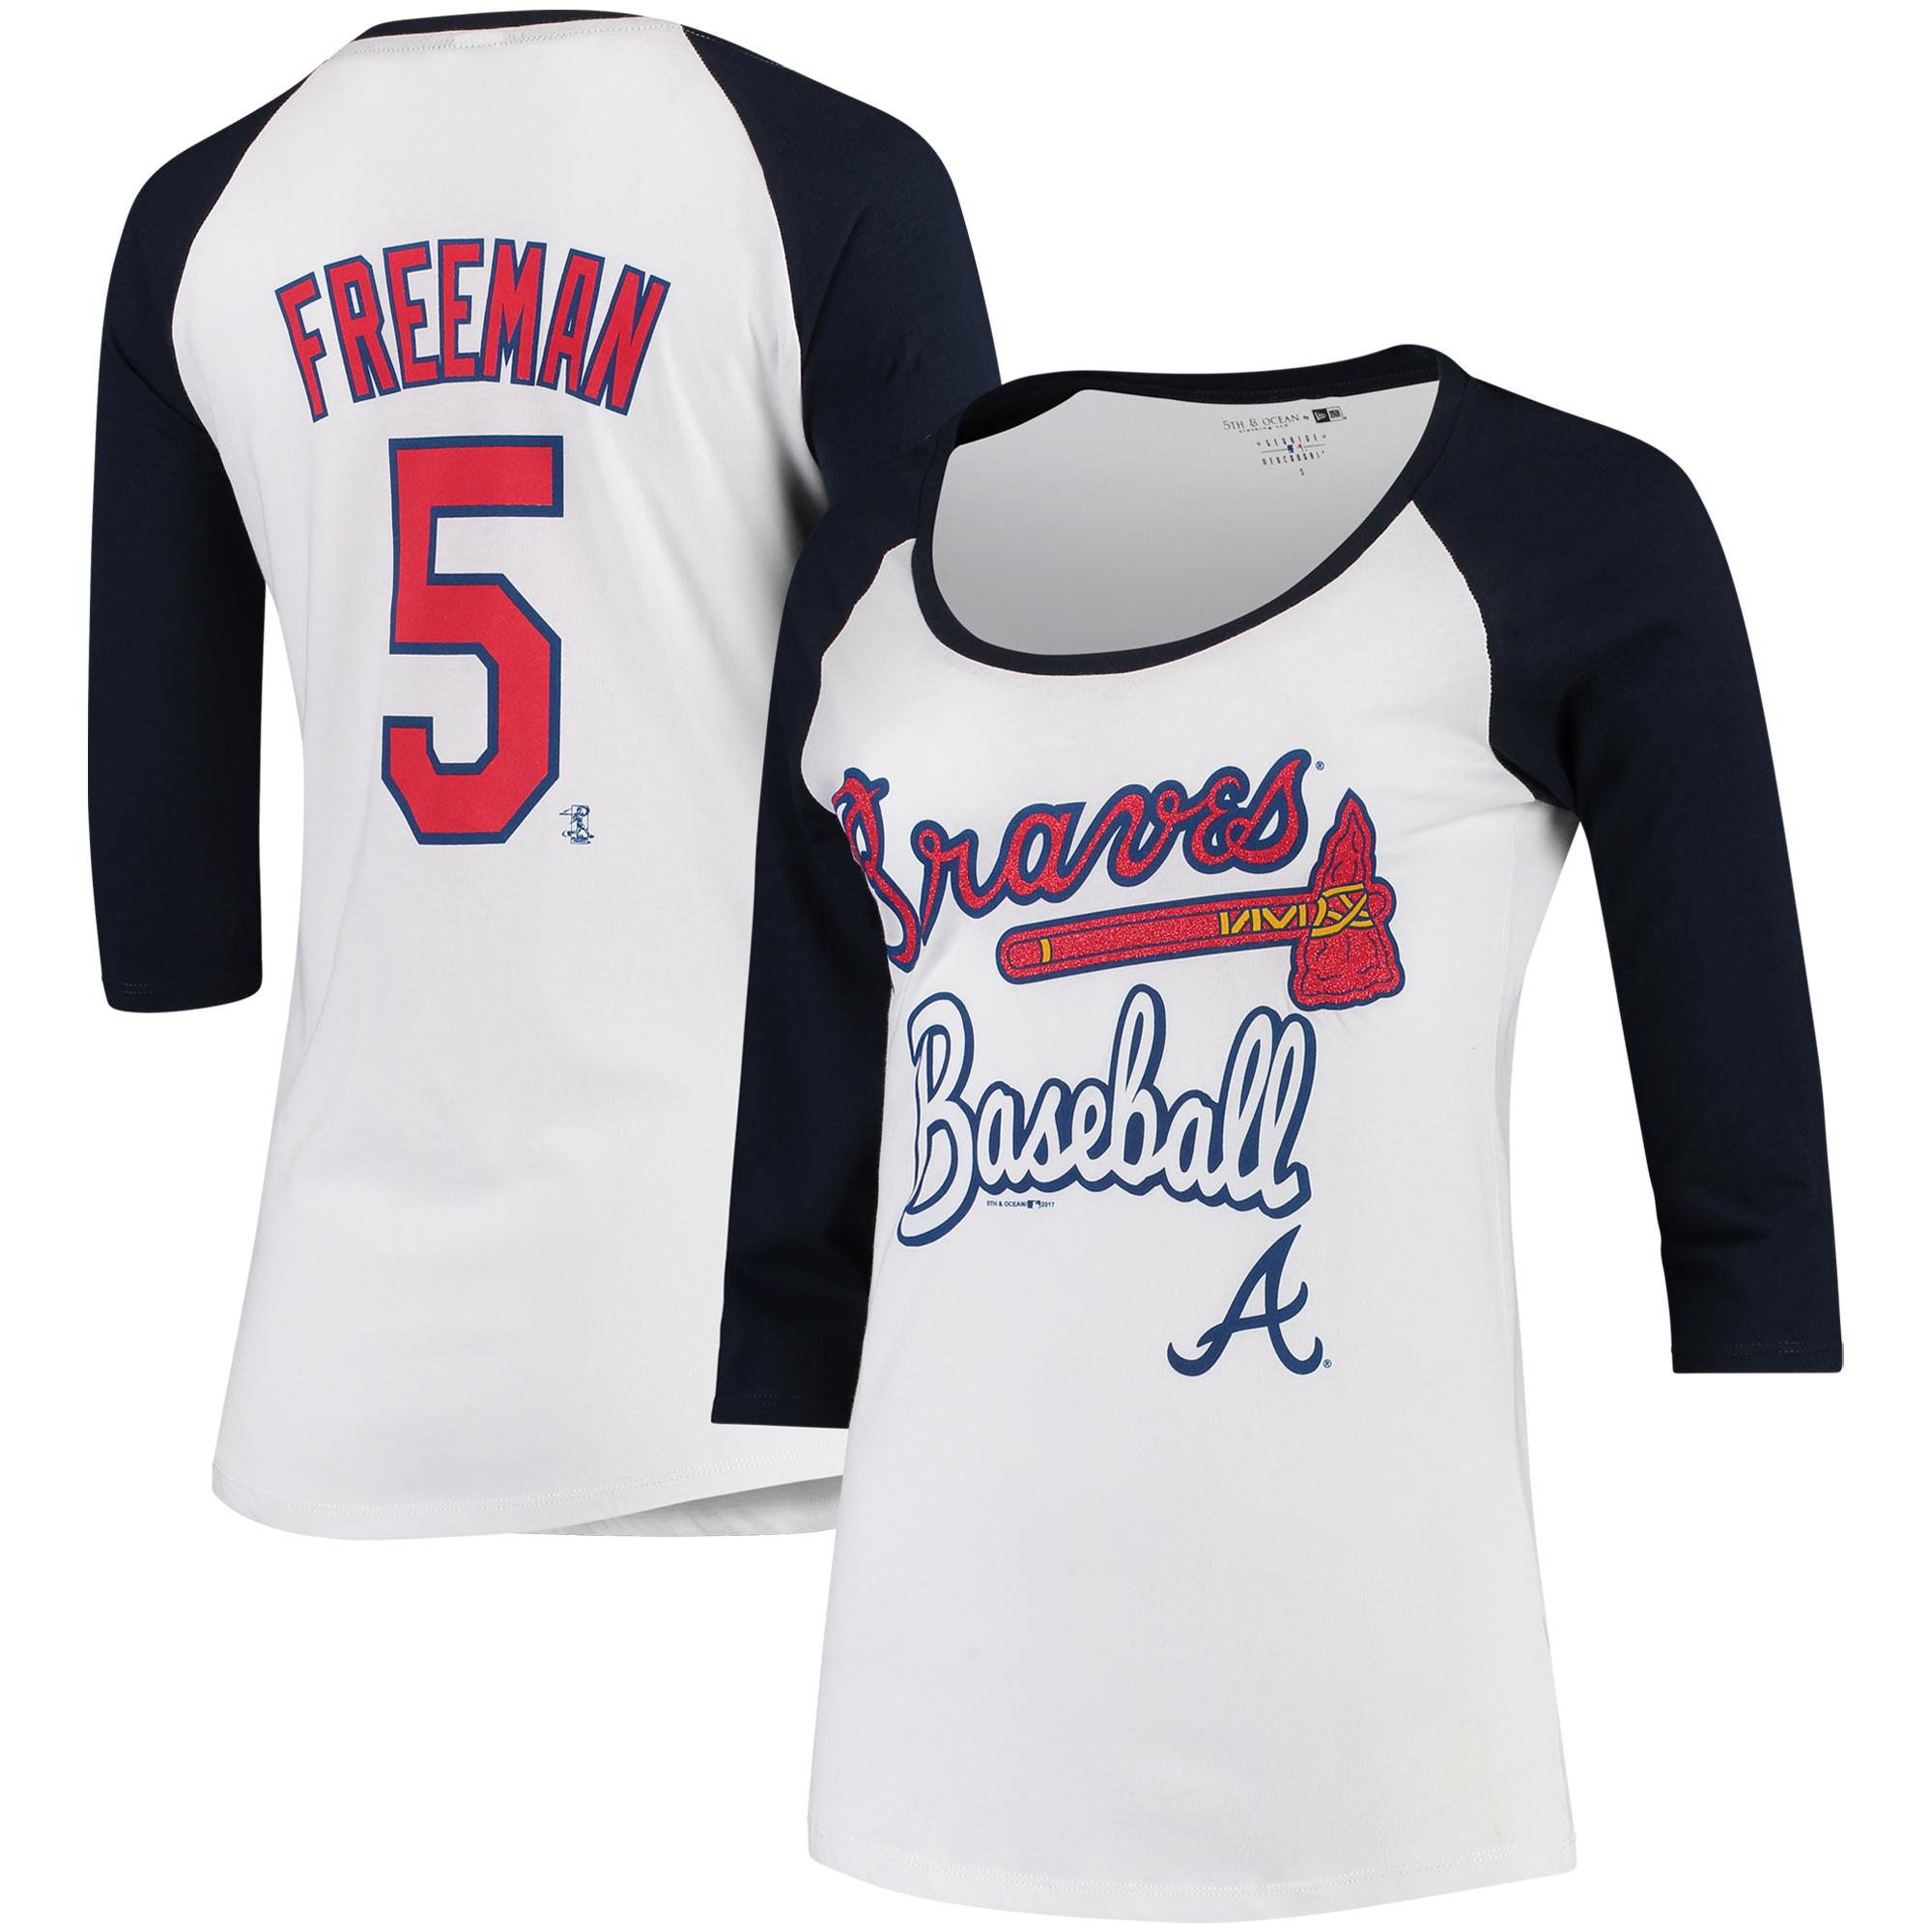 Freddie Freeman Atlanta Braves 5th & Ocean by New Era Women's Glitter 3/4-Sleeve Raglan T-Shirt - White/Navy